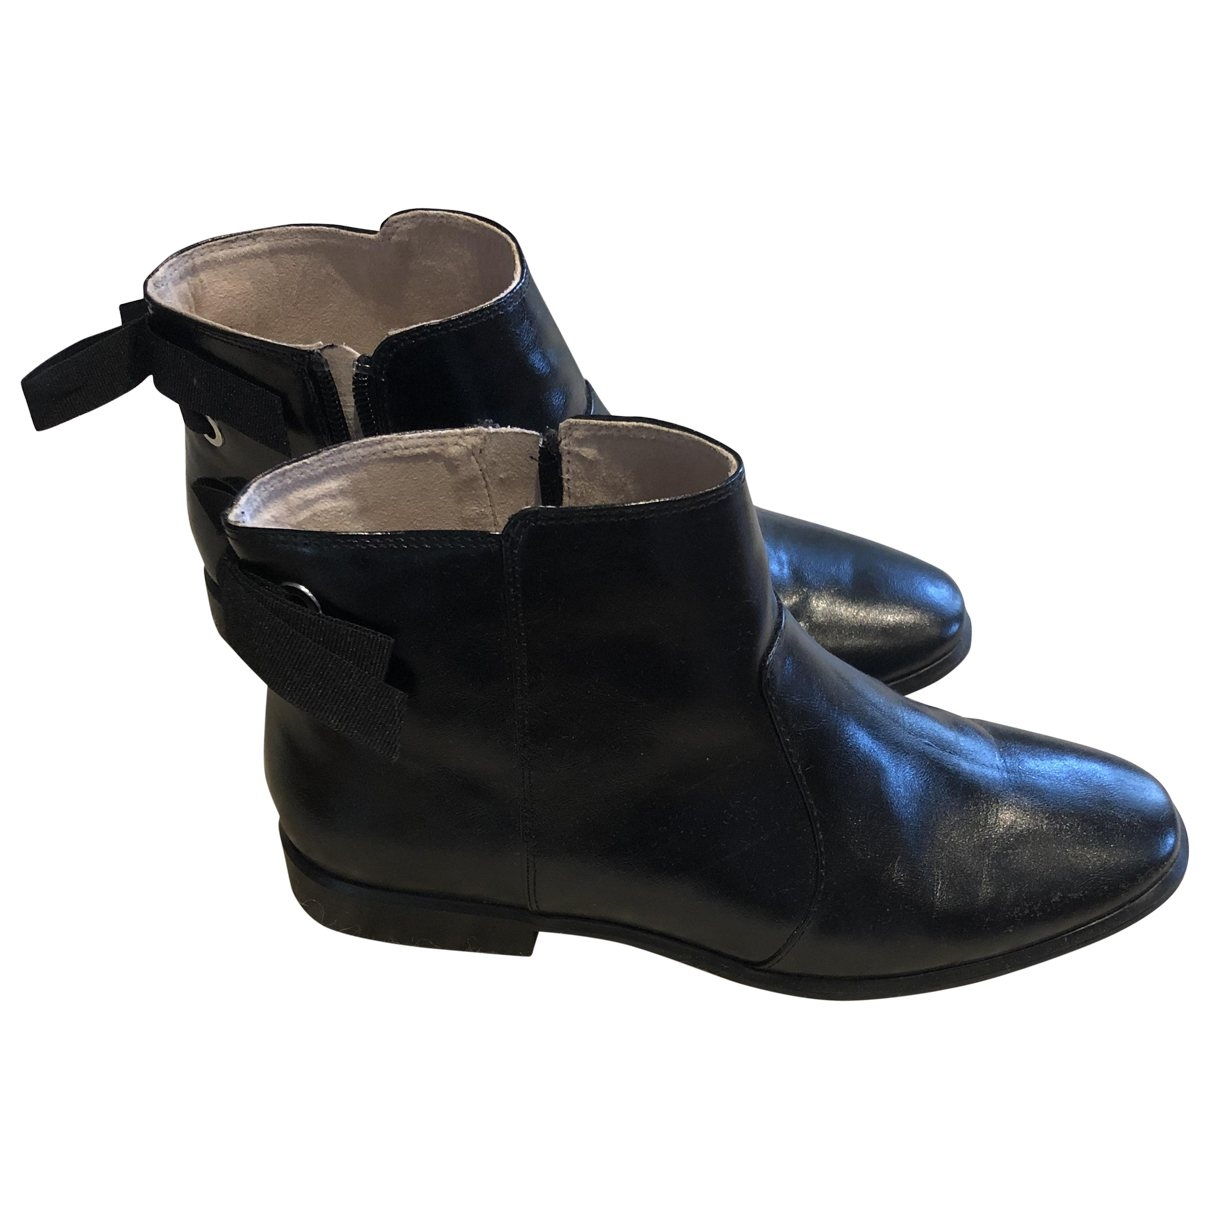 Zara \N Black Leather Boots for Women 37 EU